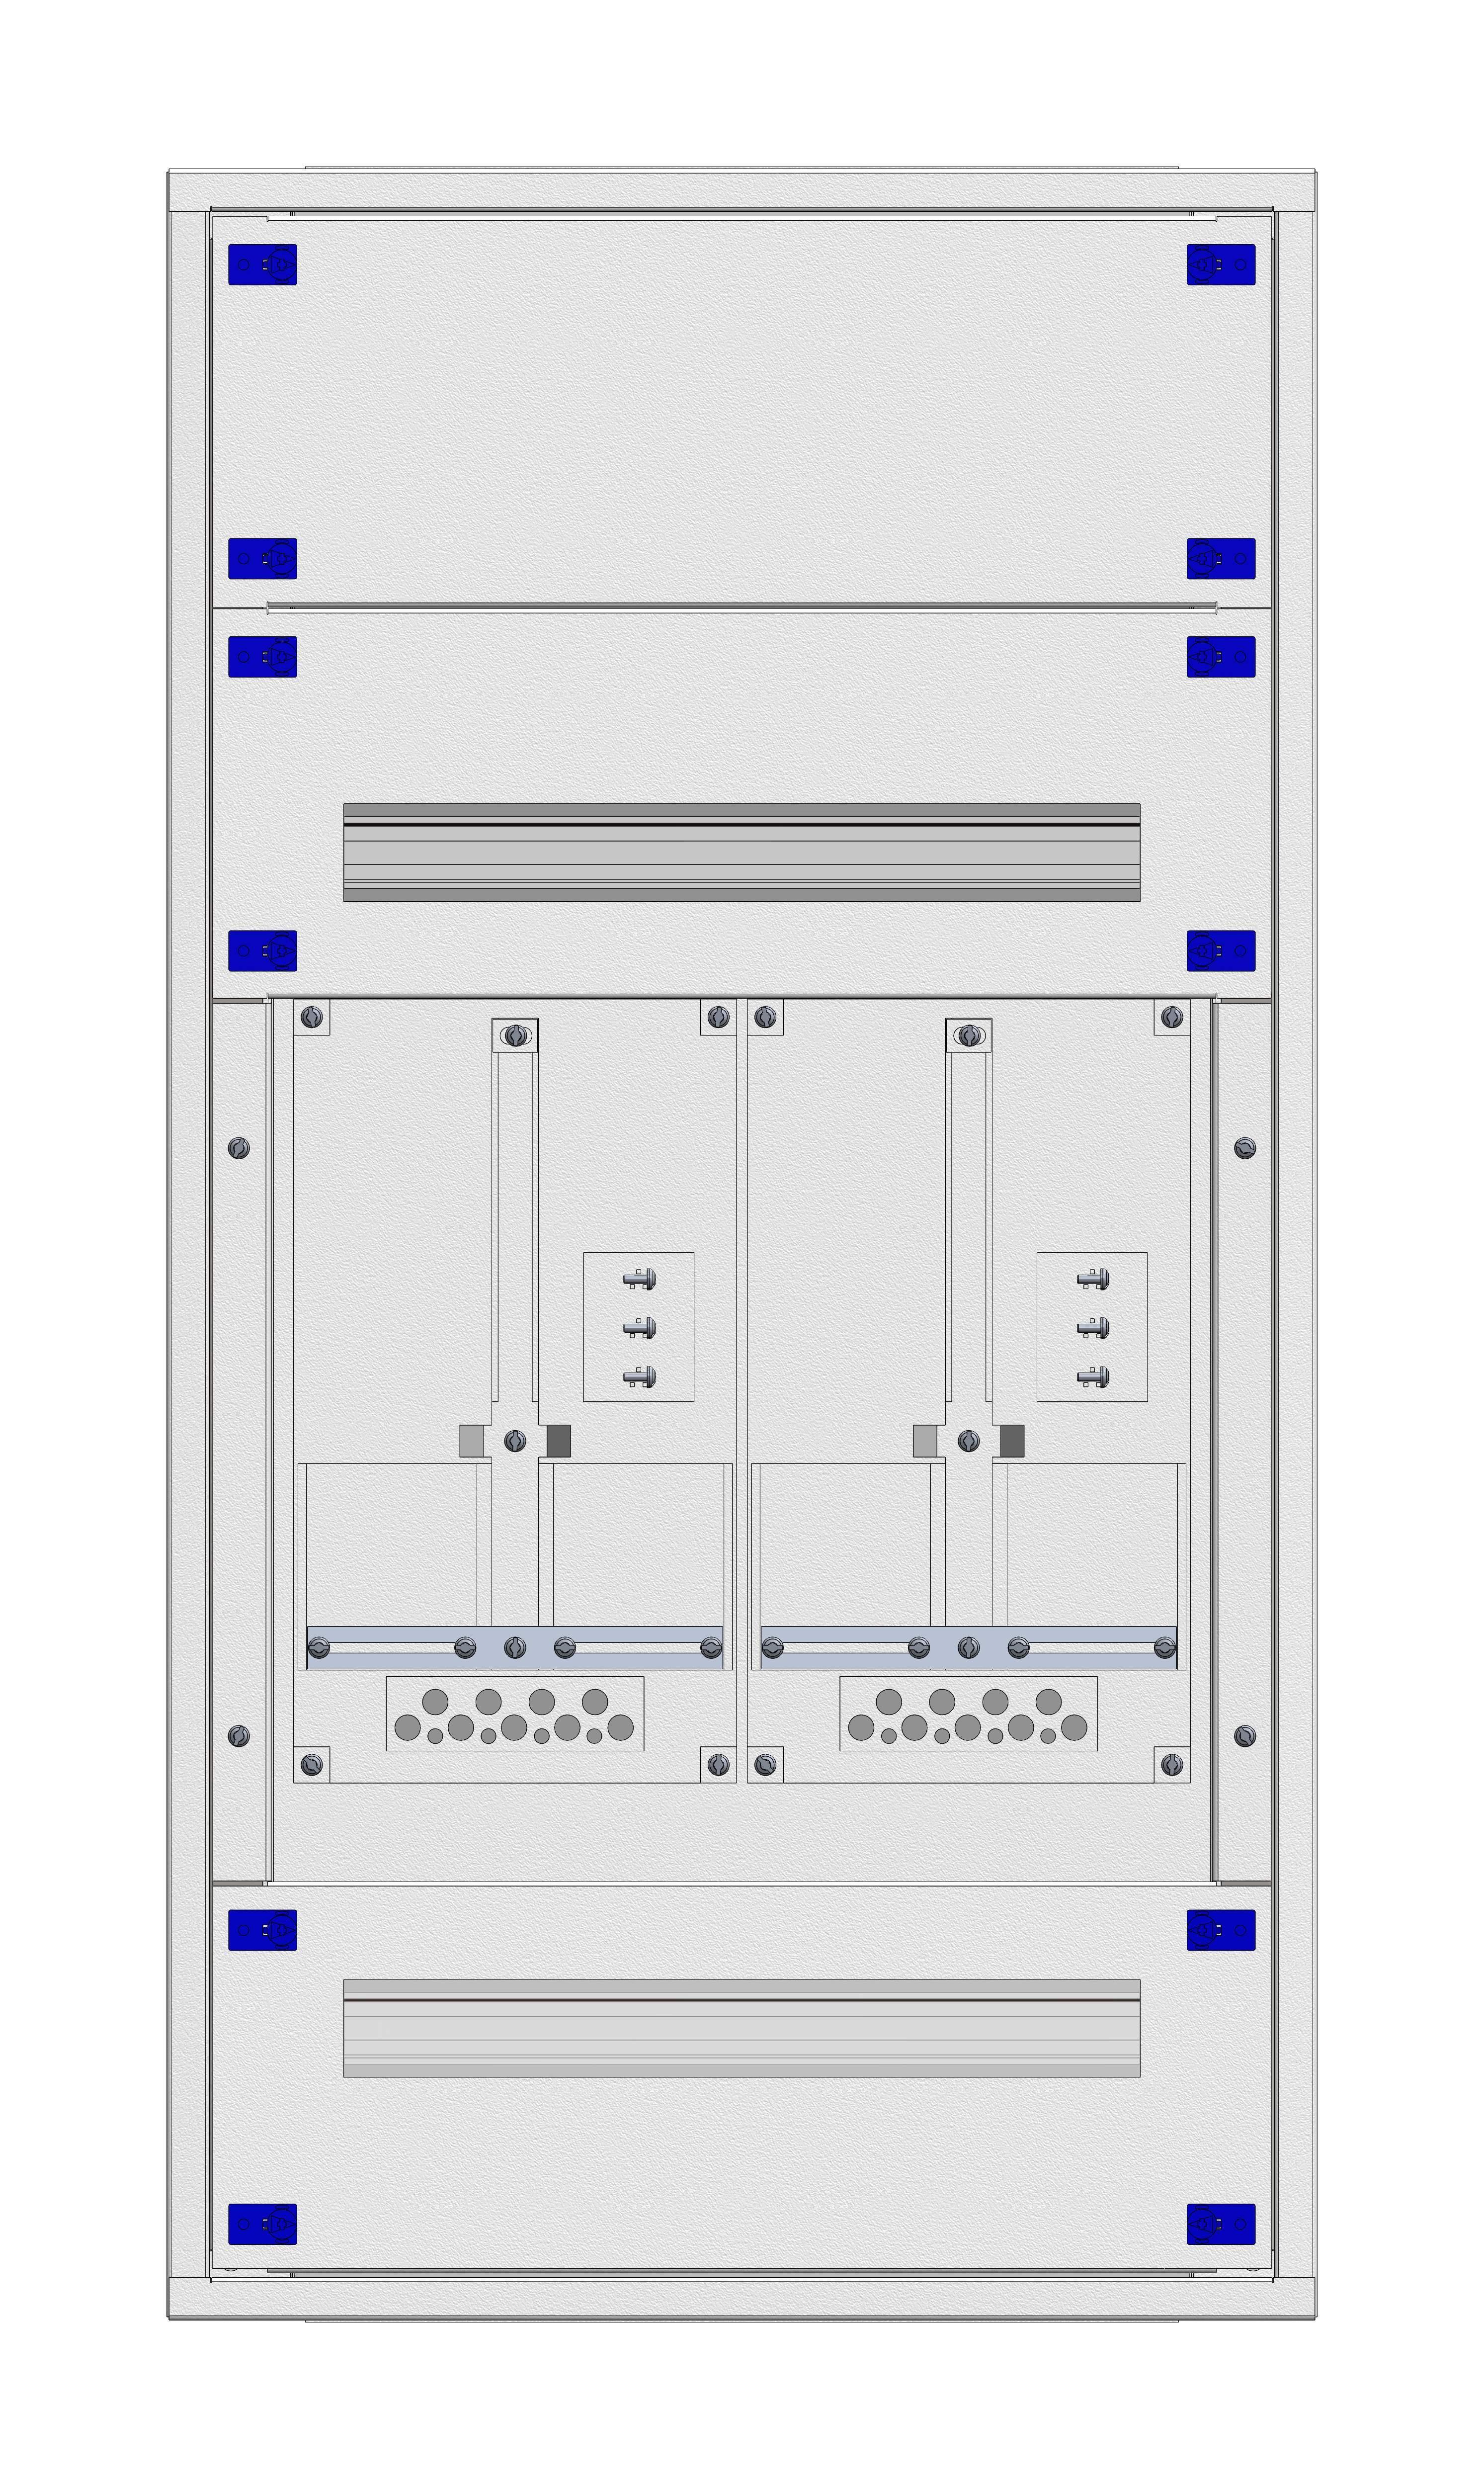 1 Stk Unterputz-Zählerverteiler 2U-21E/VBG 2ZP, H1055B590T250mm IL164221VS